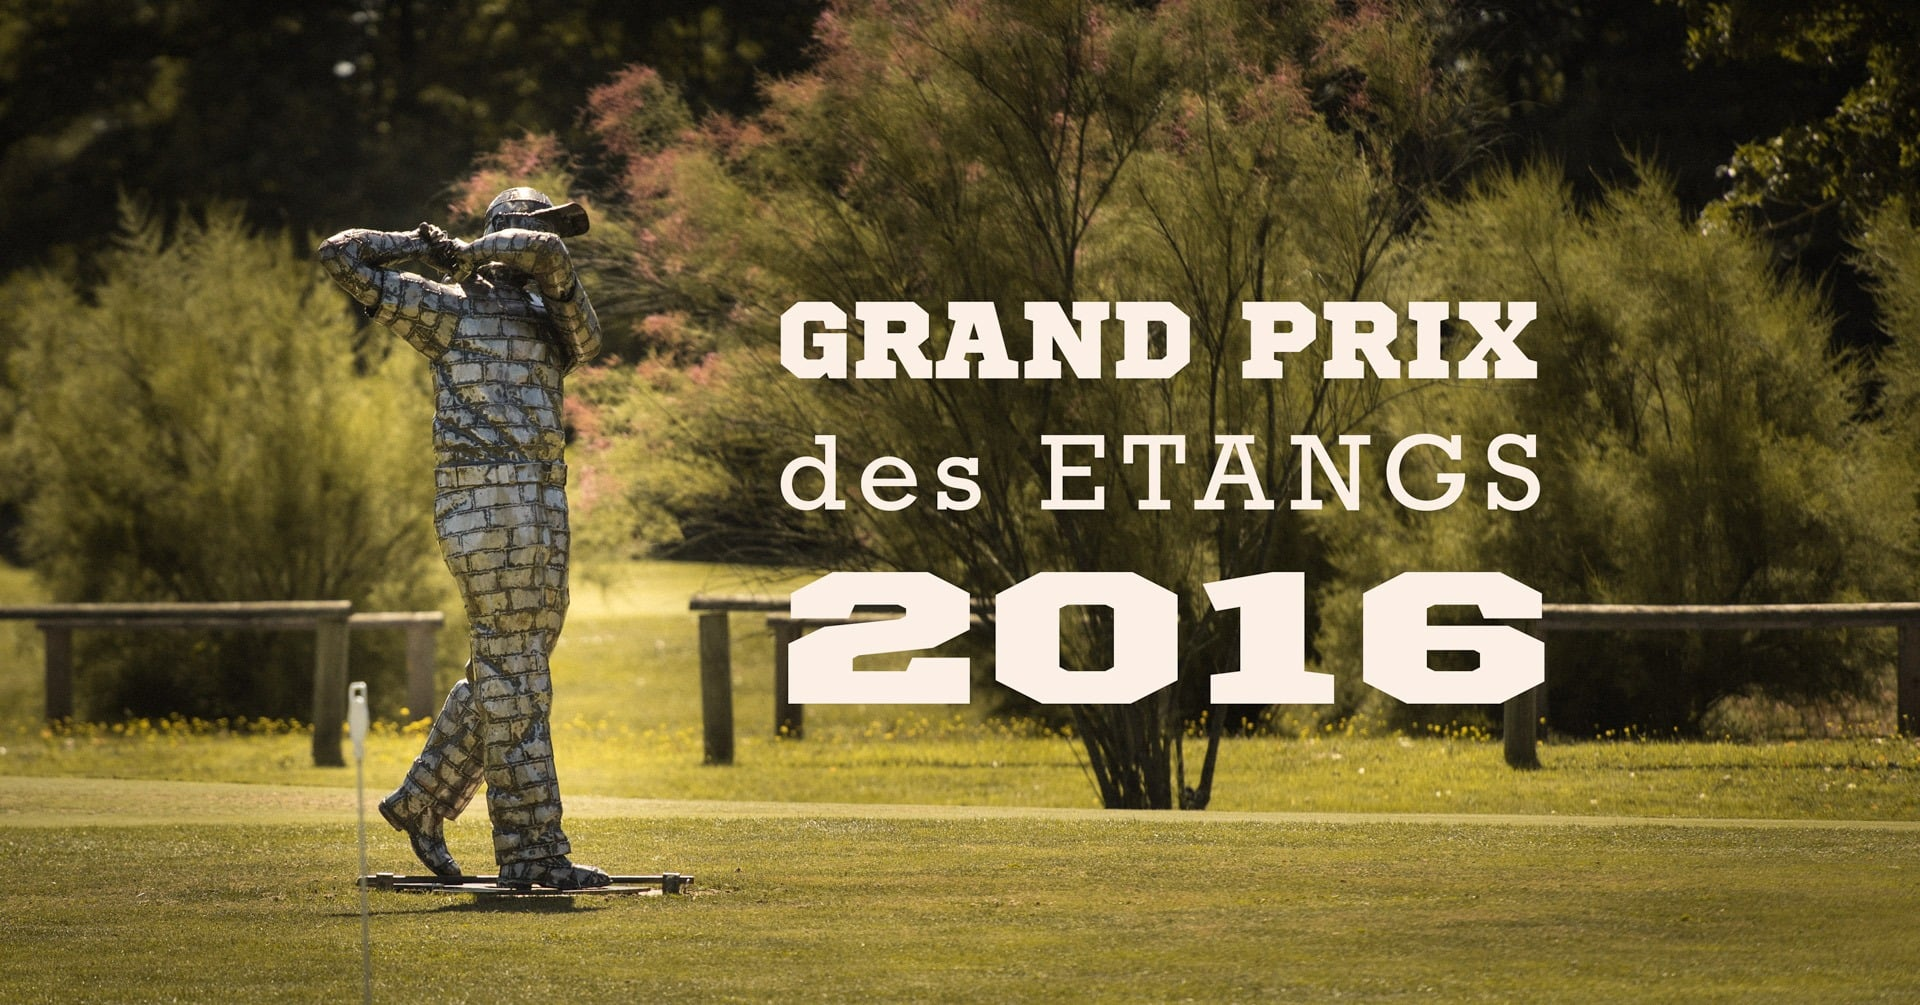 Grand Prix des Etangs 2016 01